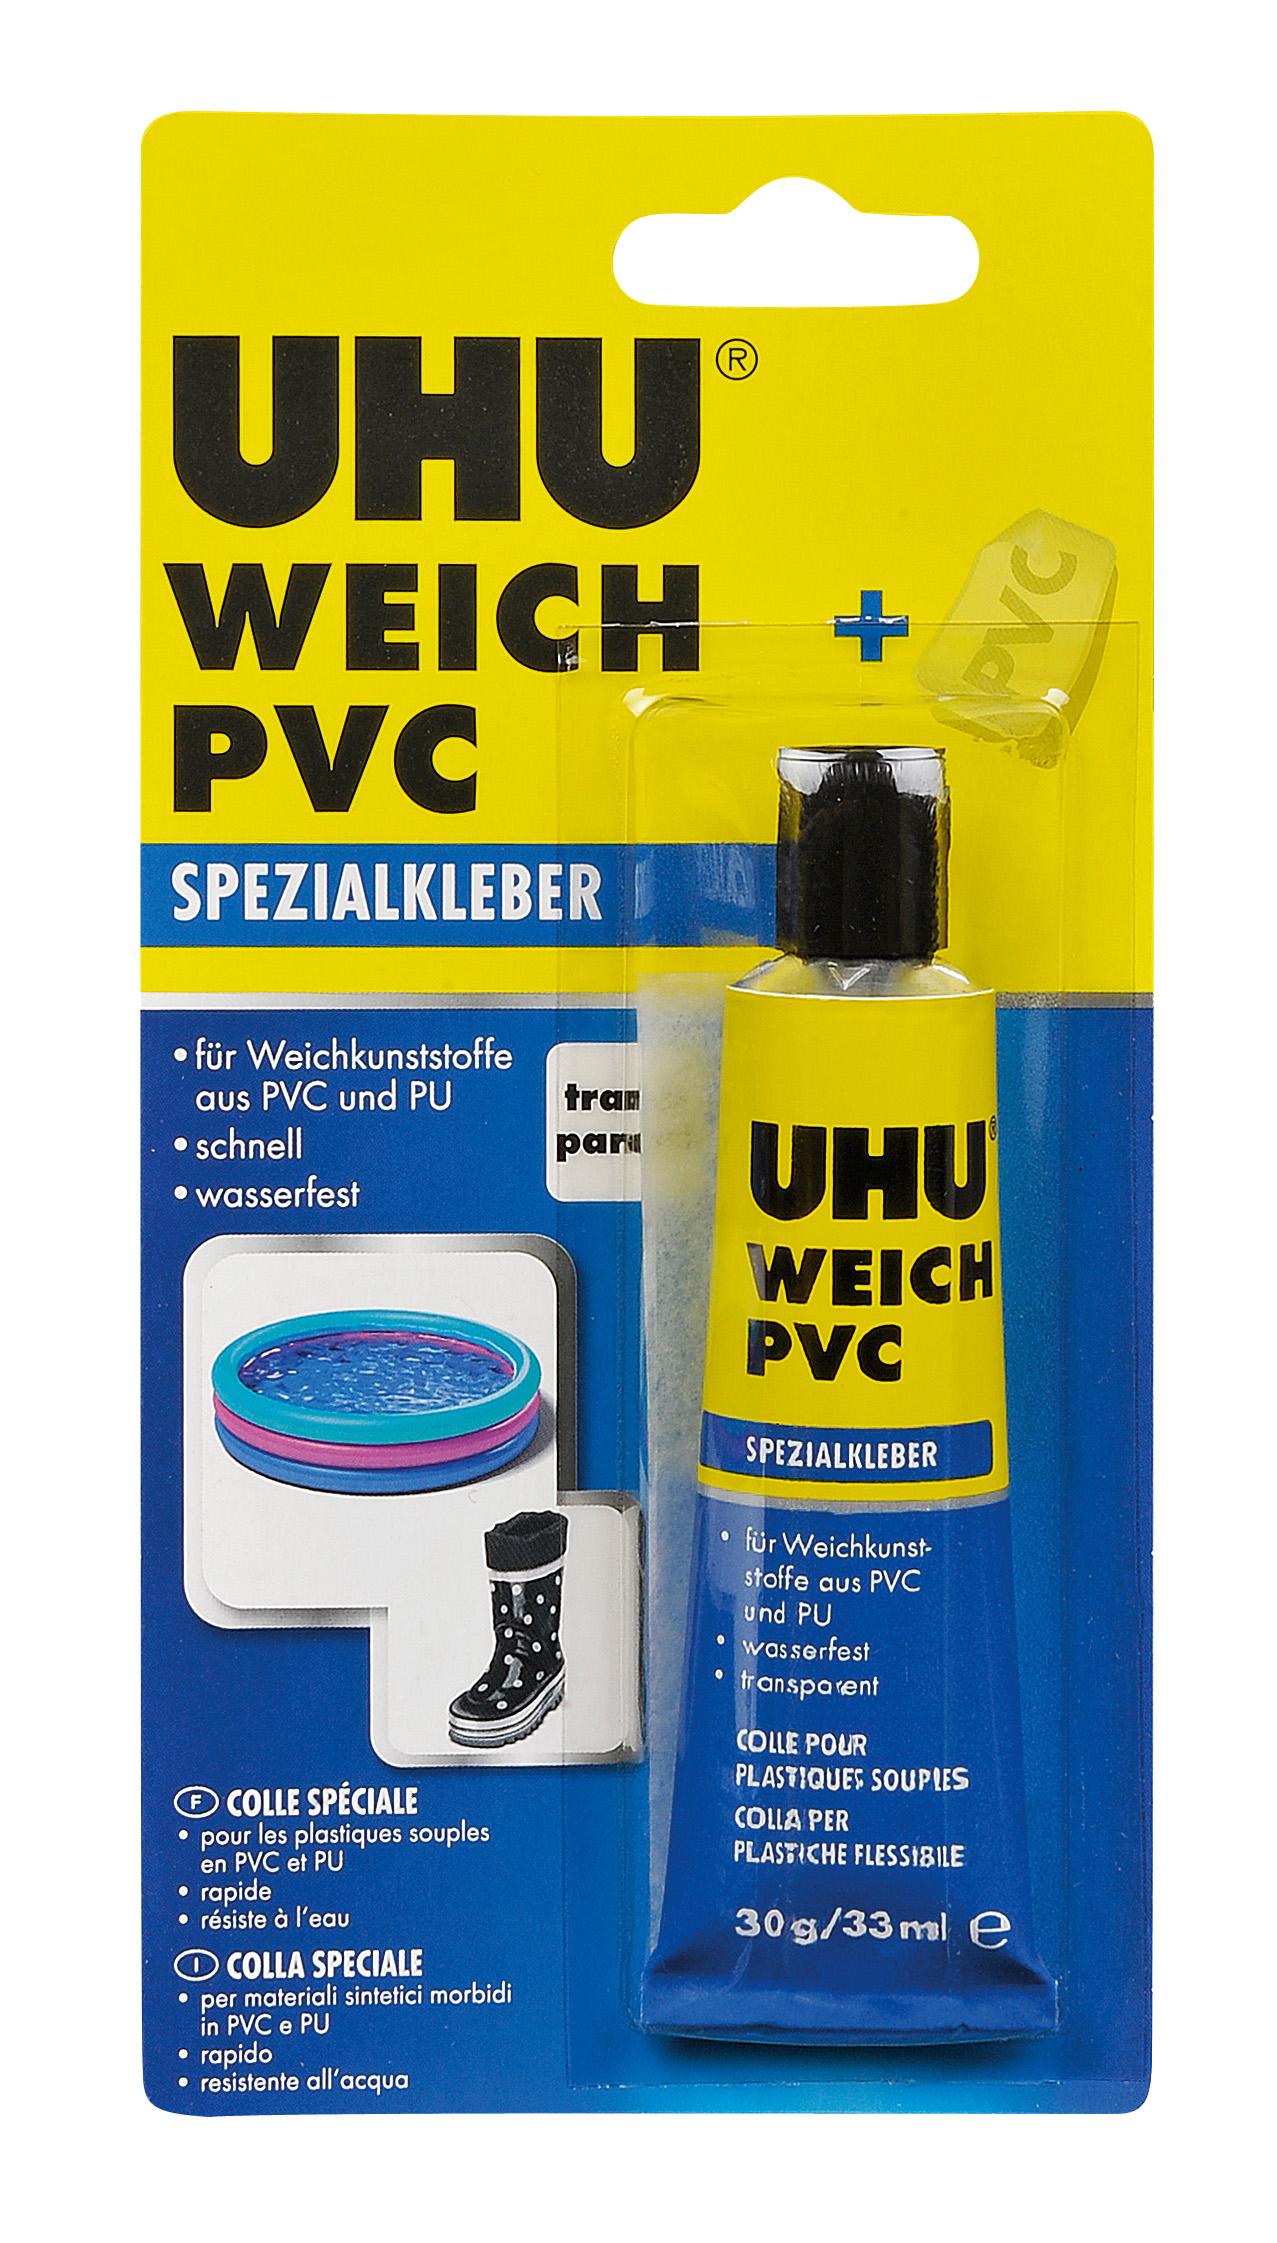 UHU weich PVC 30g Tube Infokarte